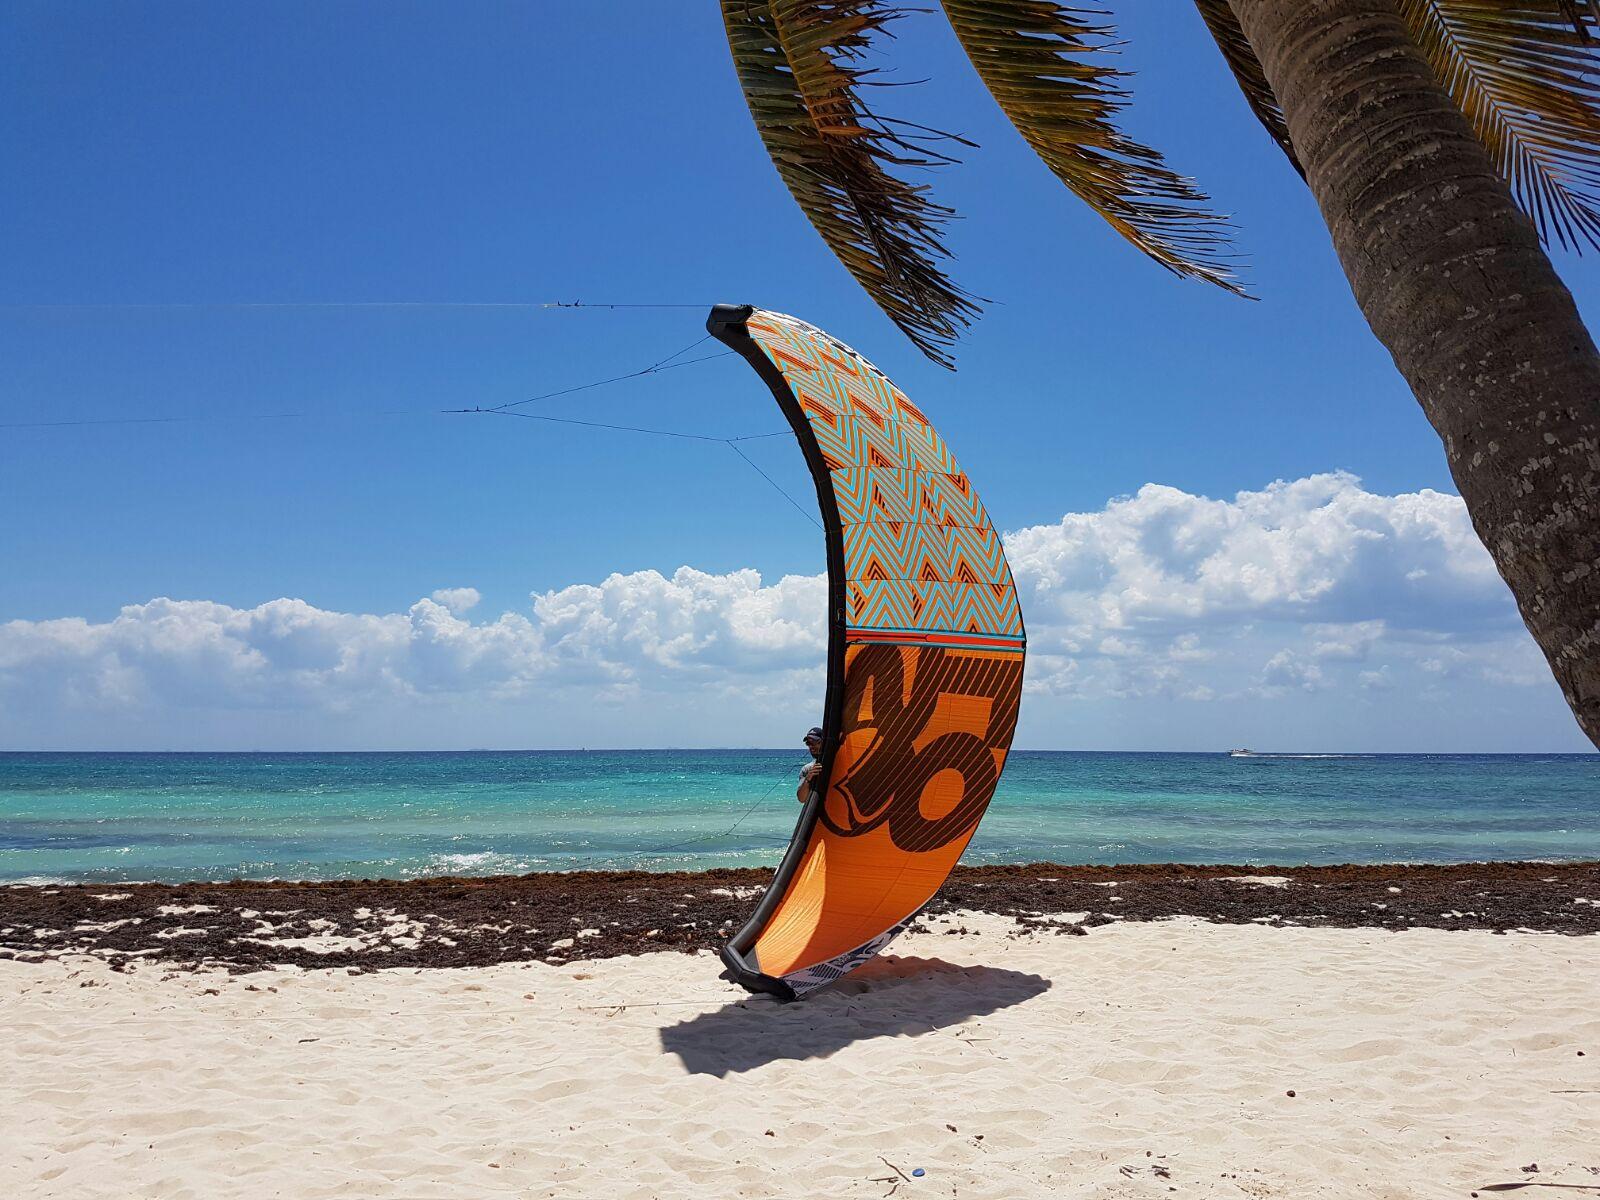 kite 12m solo usado